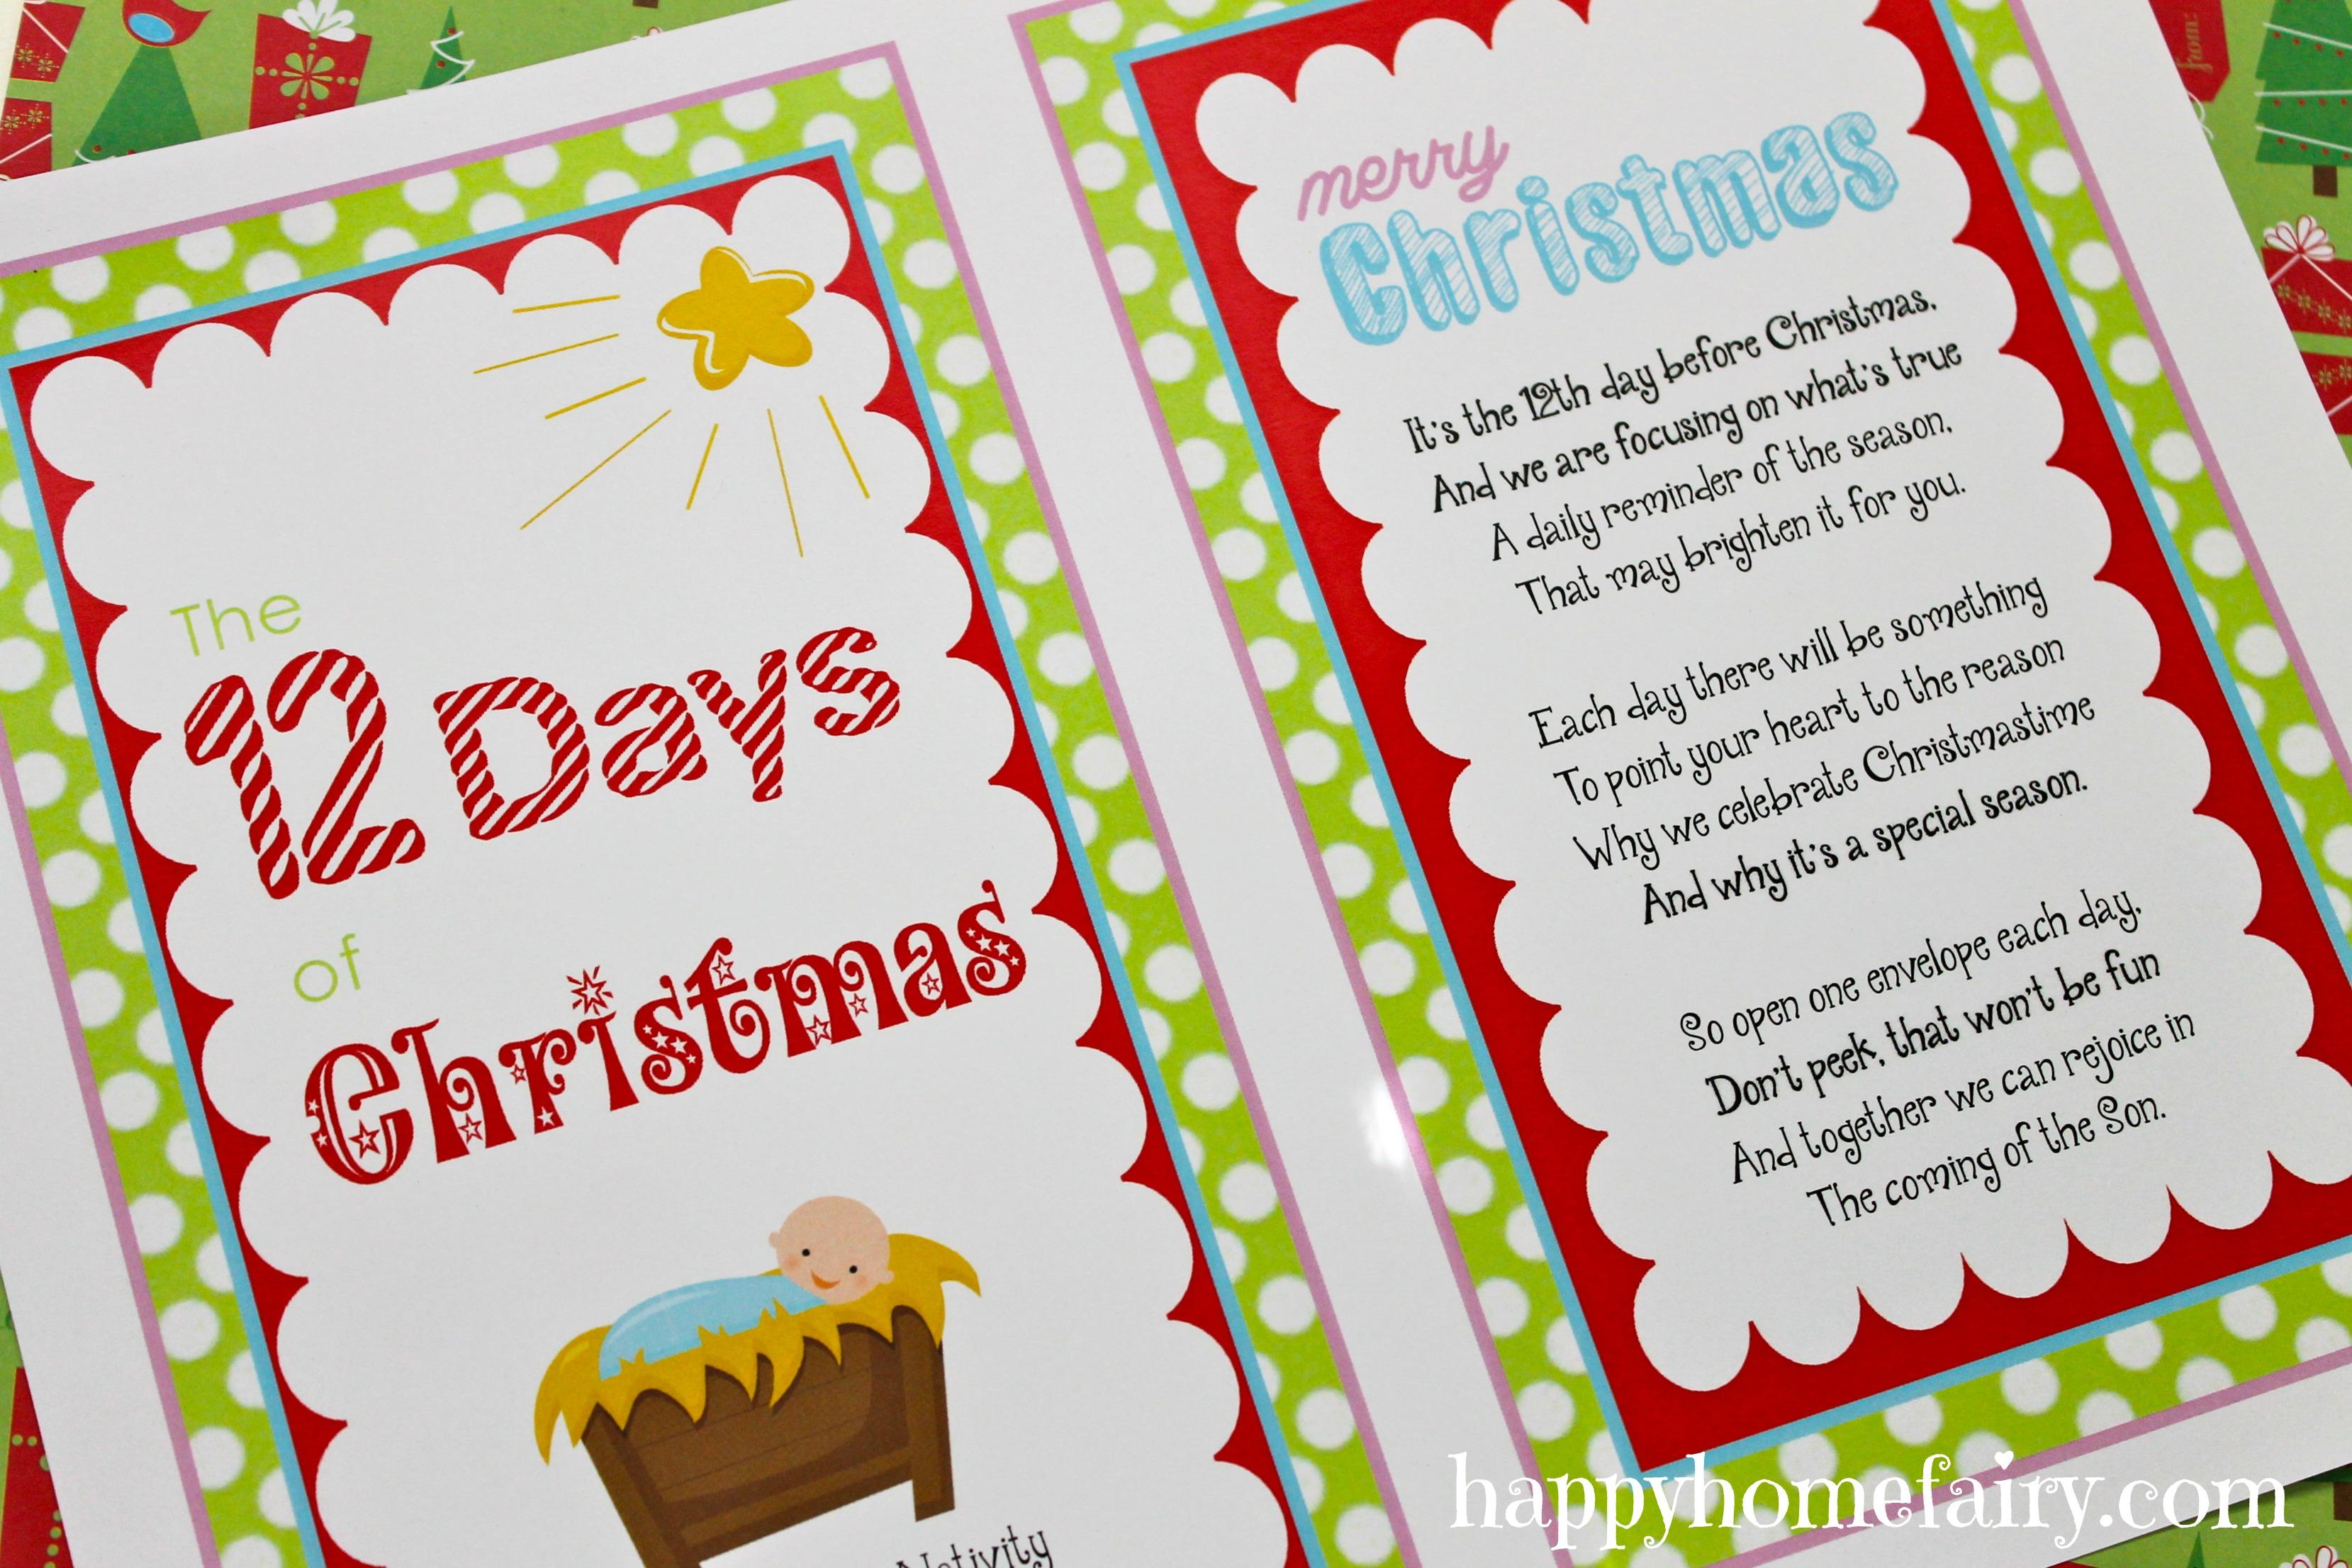 12 Days Cards 14